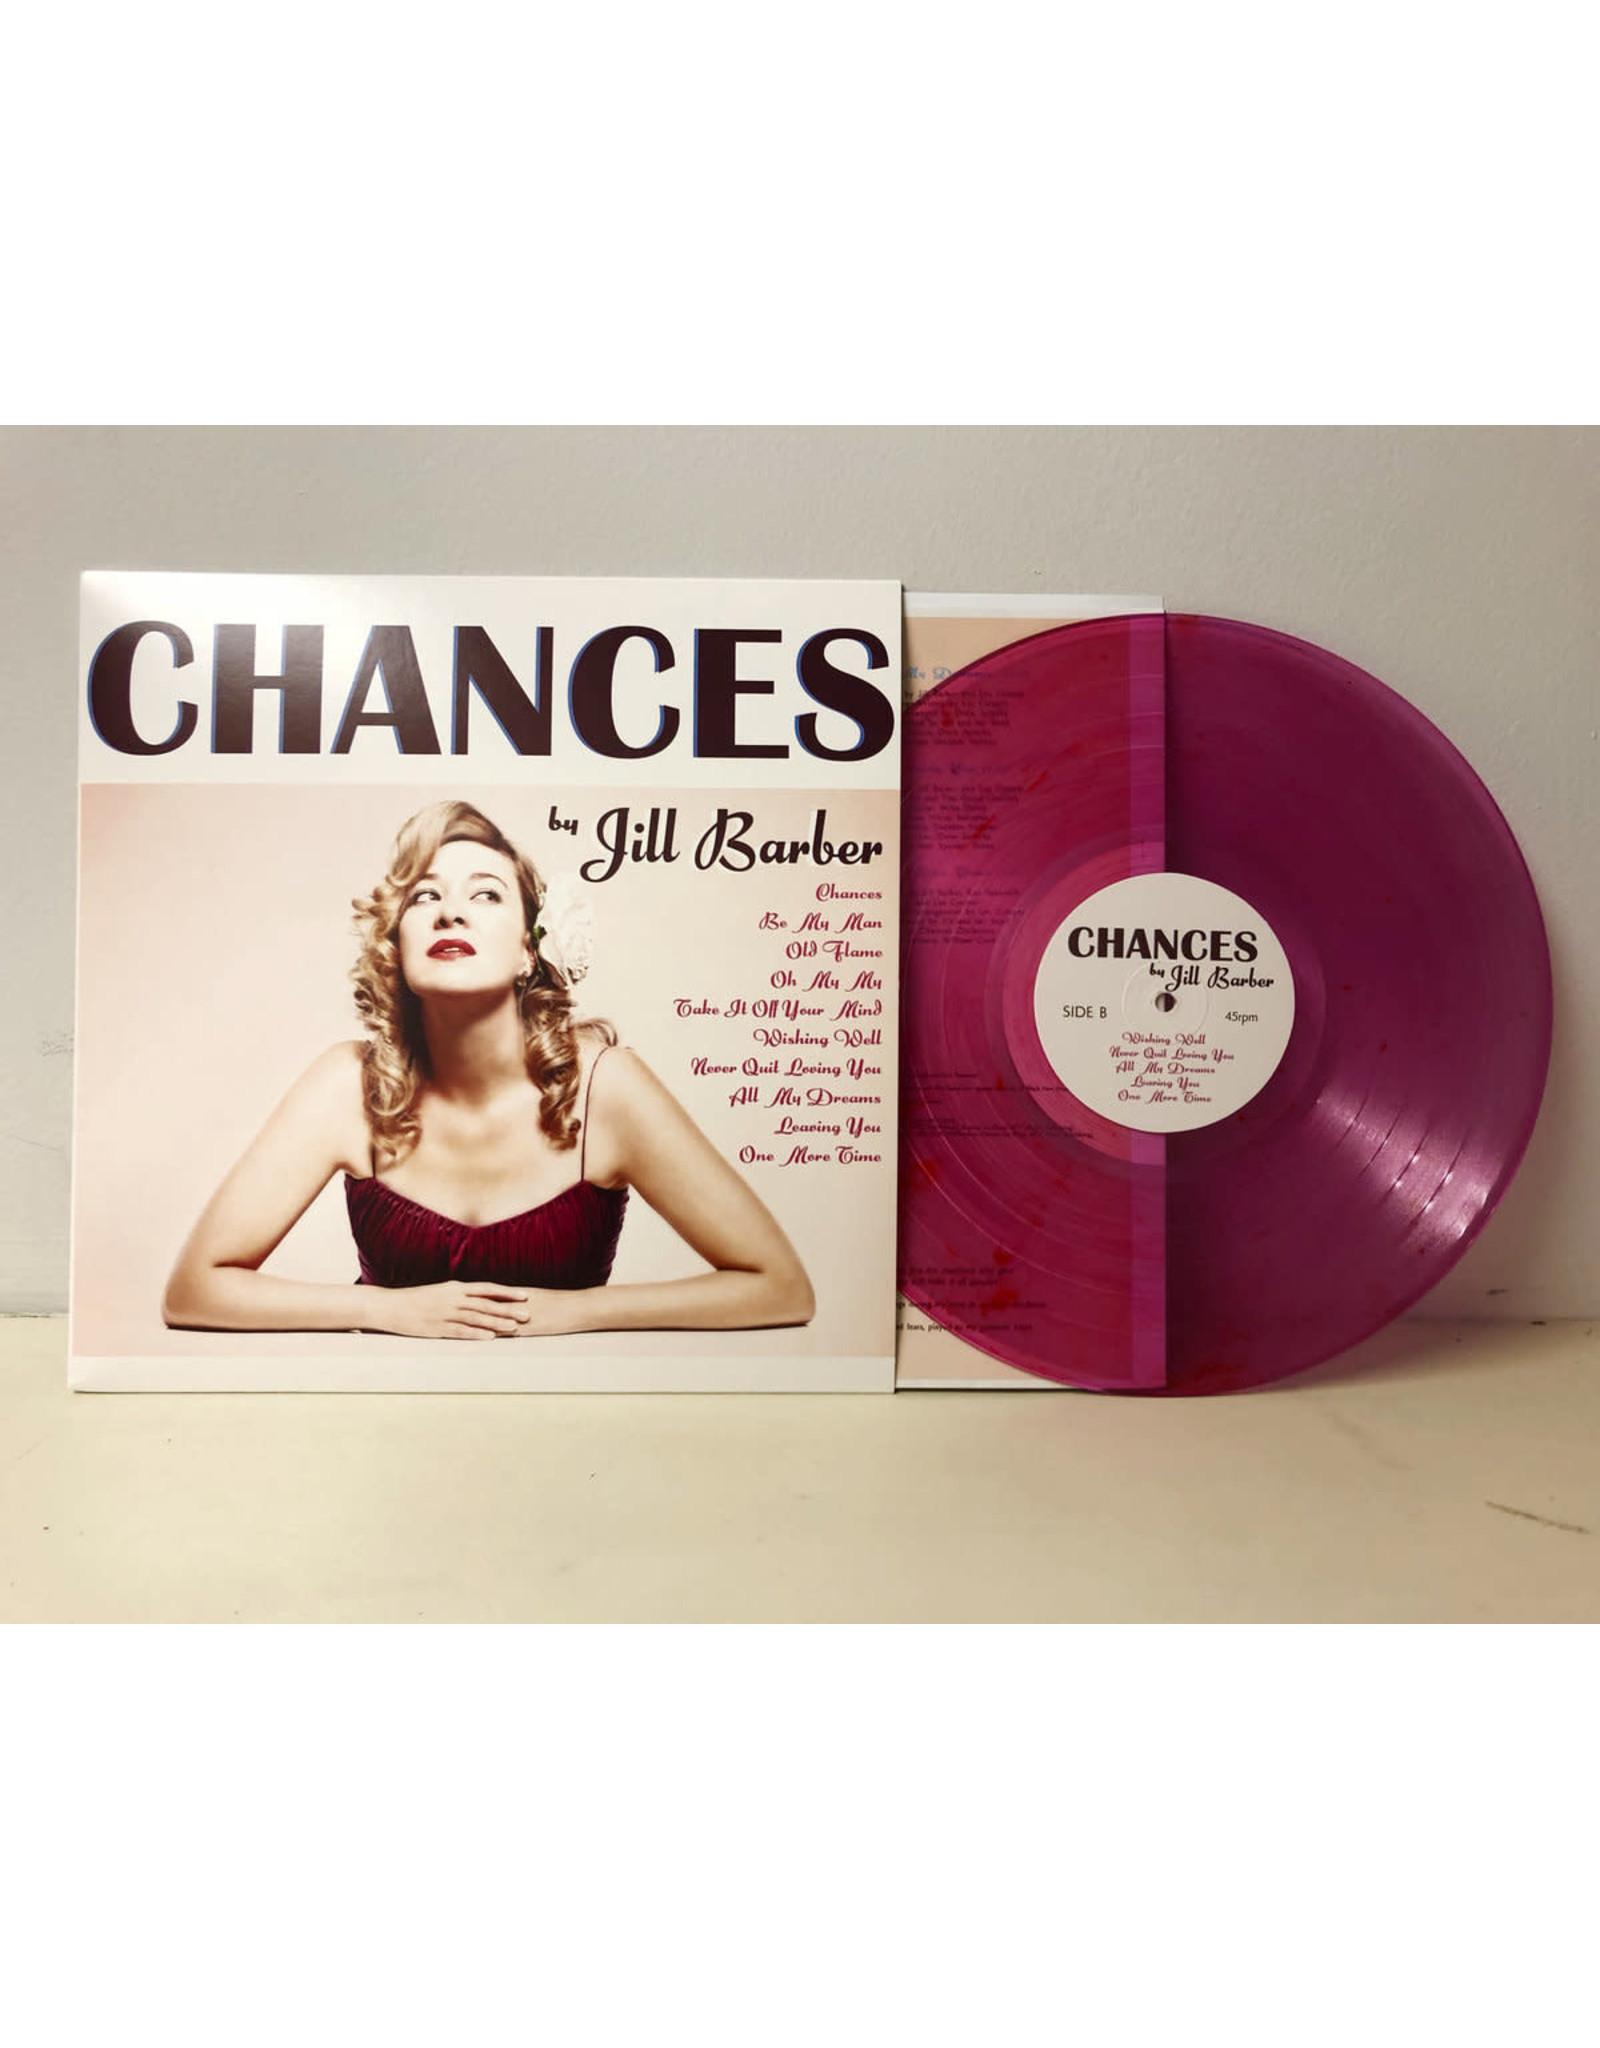 Jill Barber - Chances (Limited Pink Taffy Vinyl)